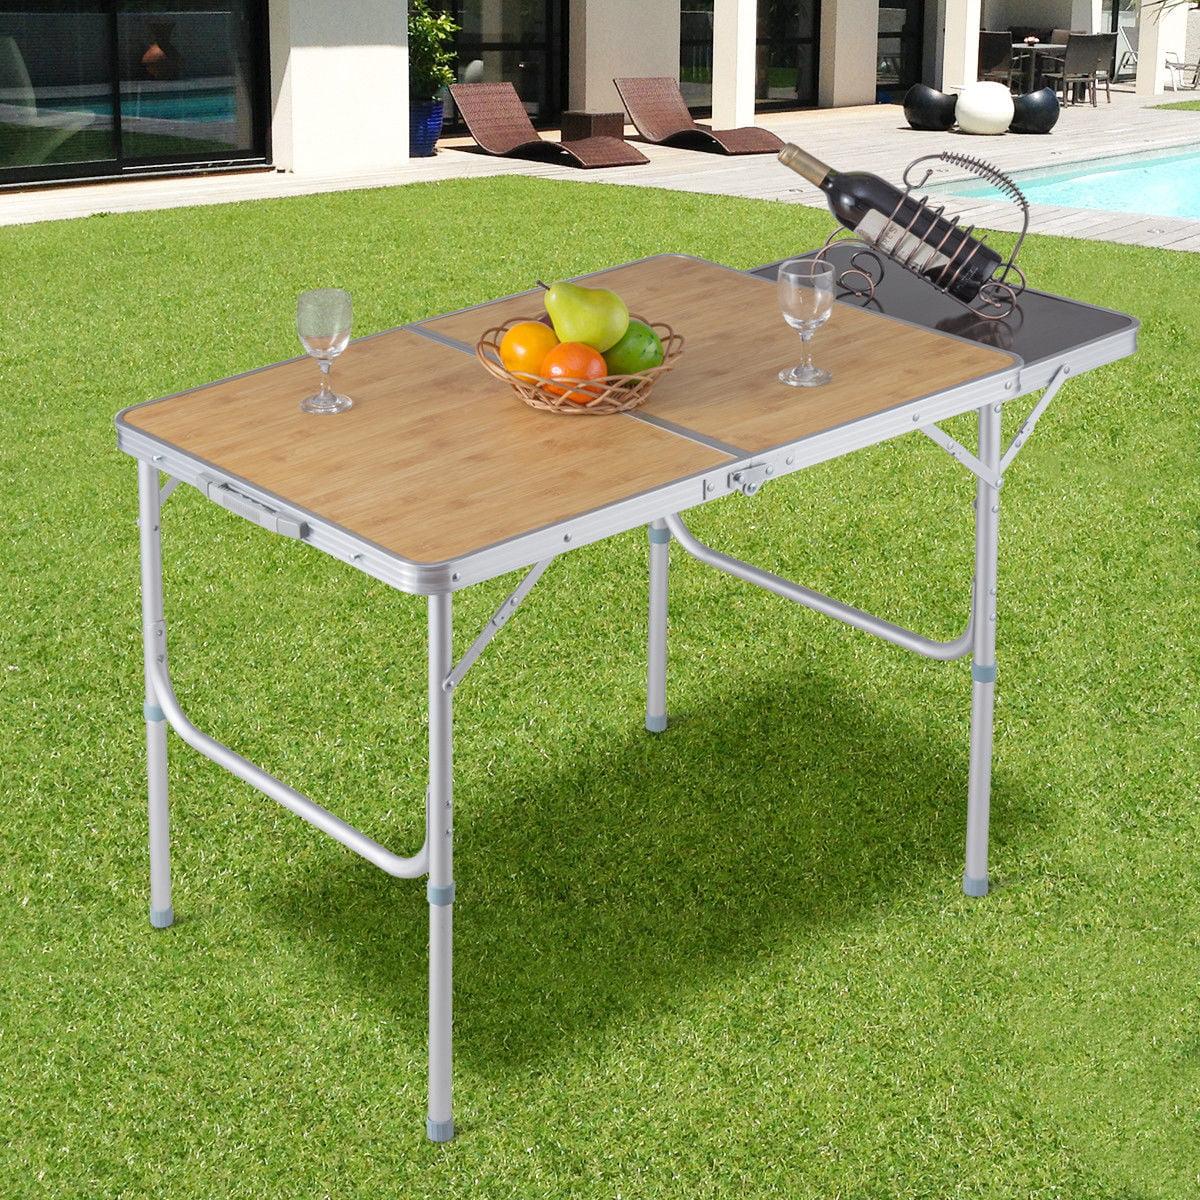 Costway Aluminum Folding Picnic Camping Table Lightweight Indoor Outdoor Garden Party